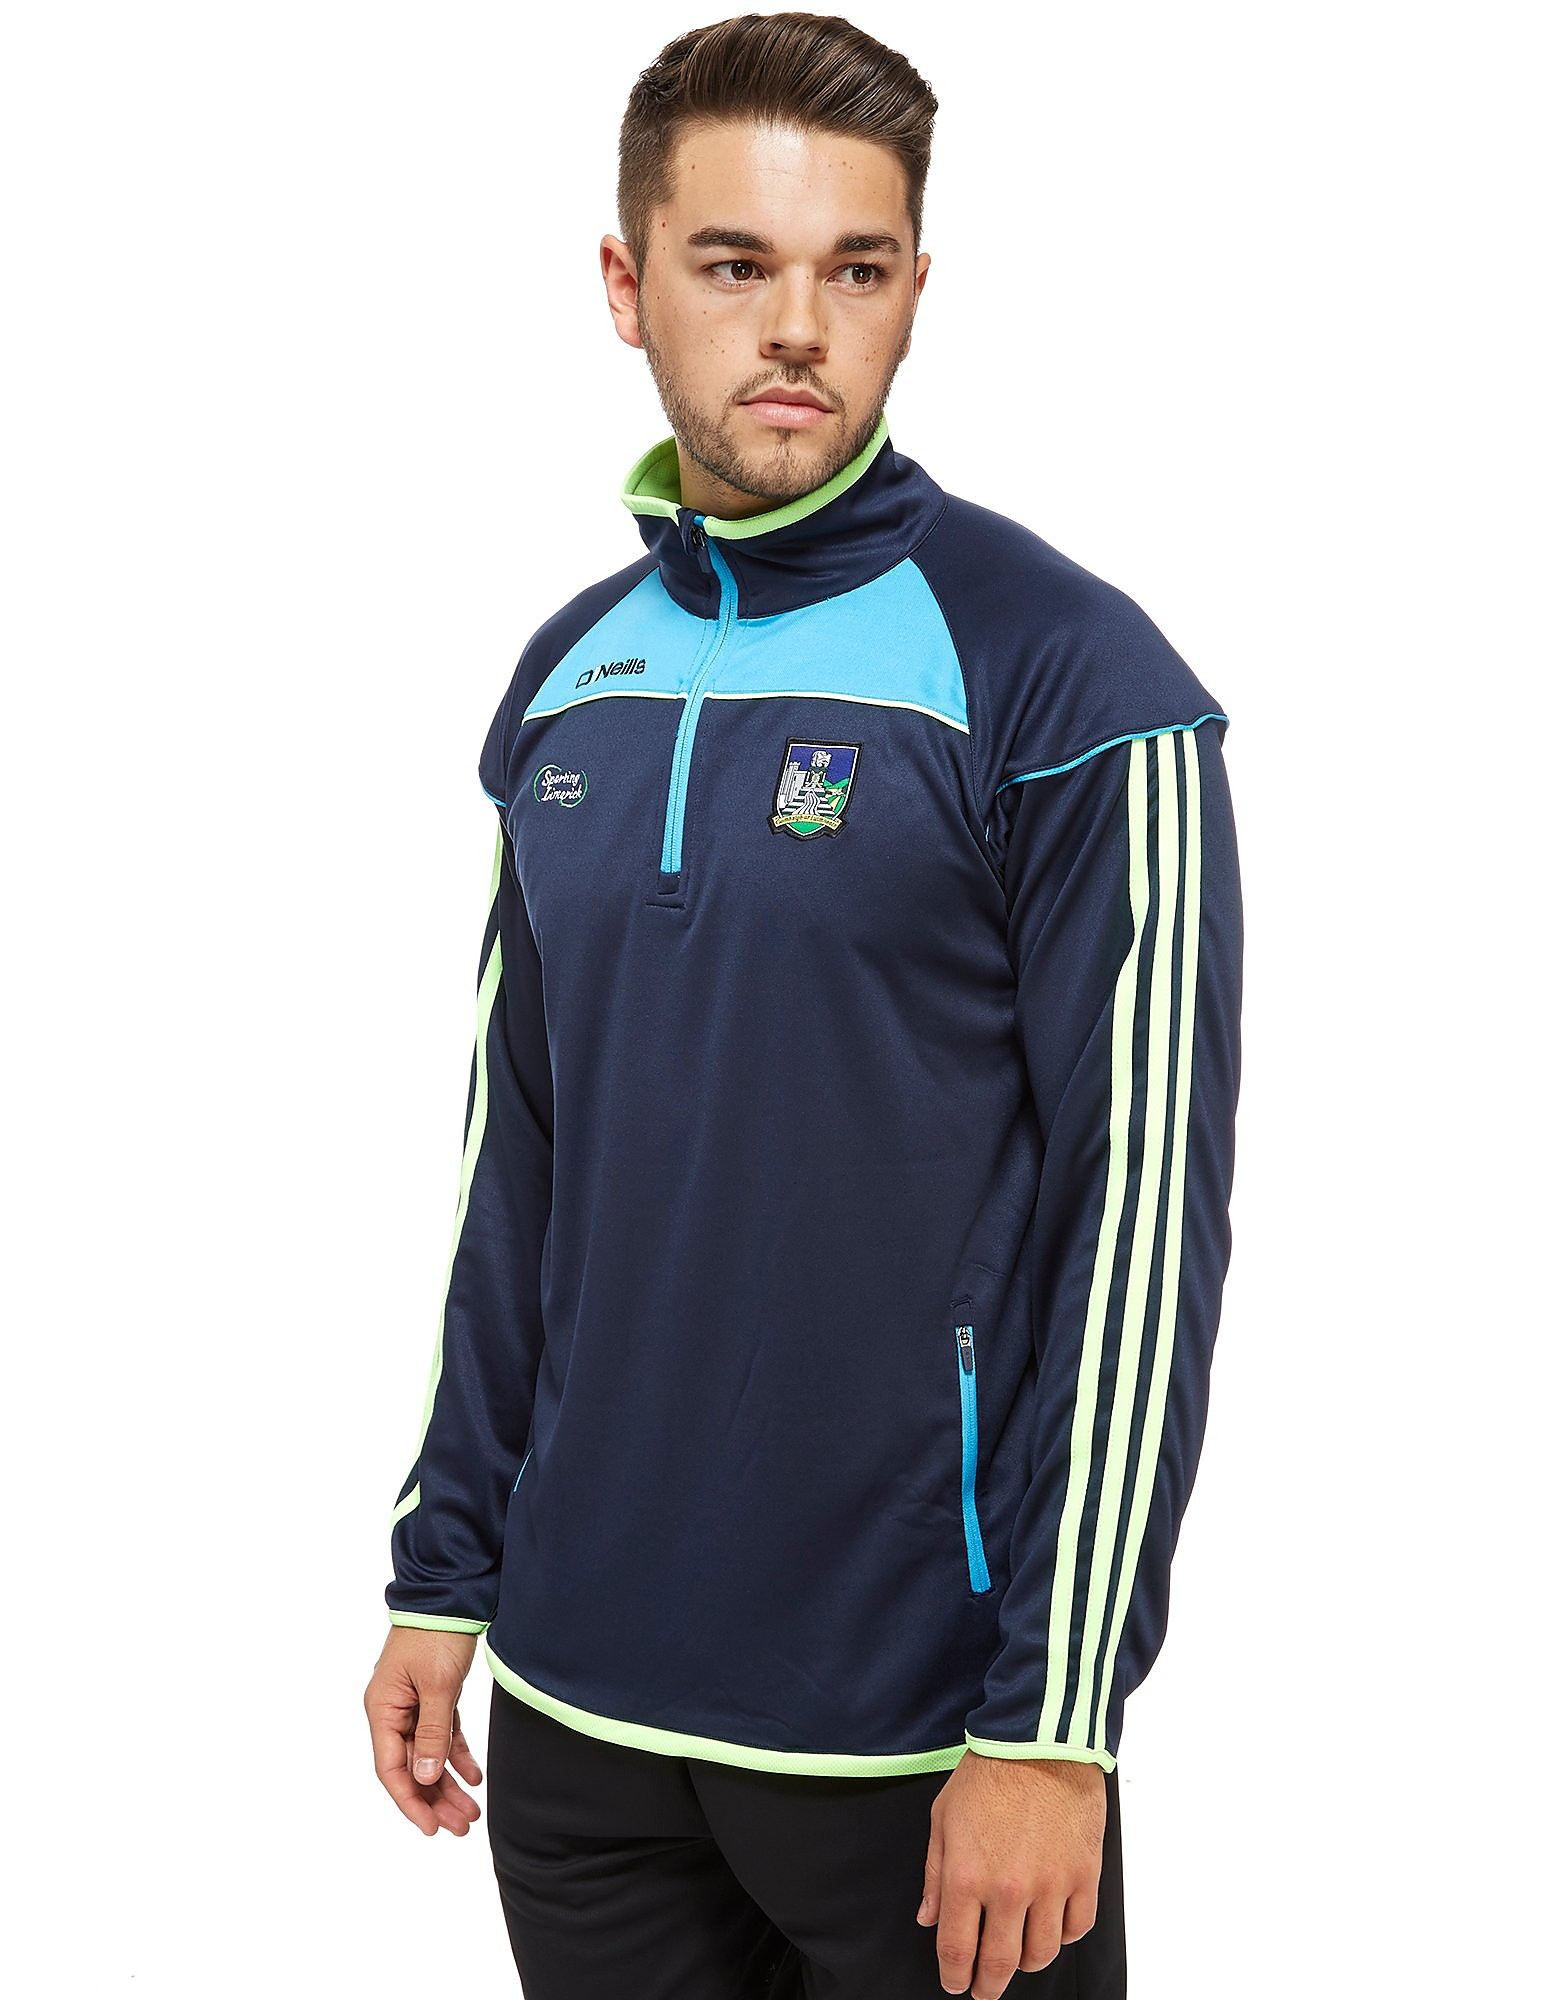 O'Neills Limerick Training Top